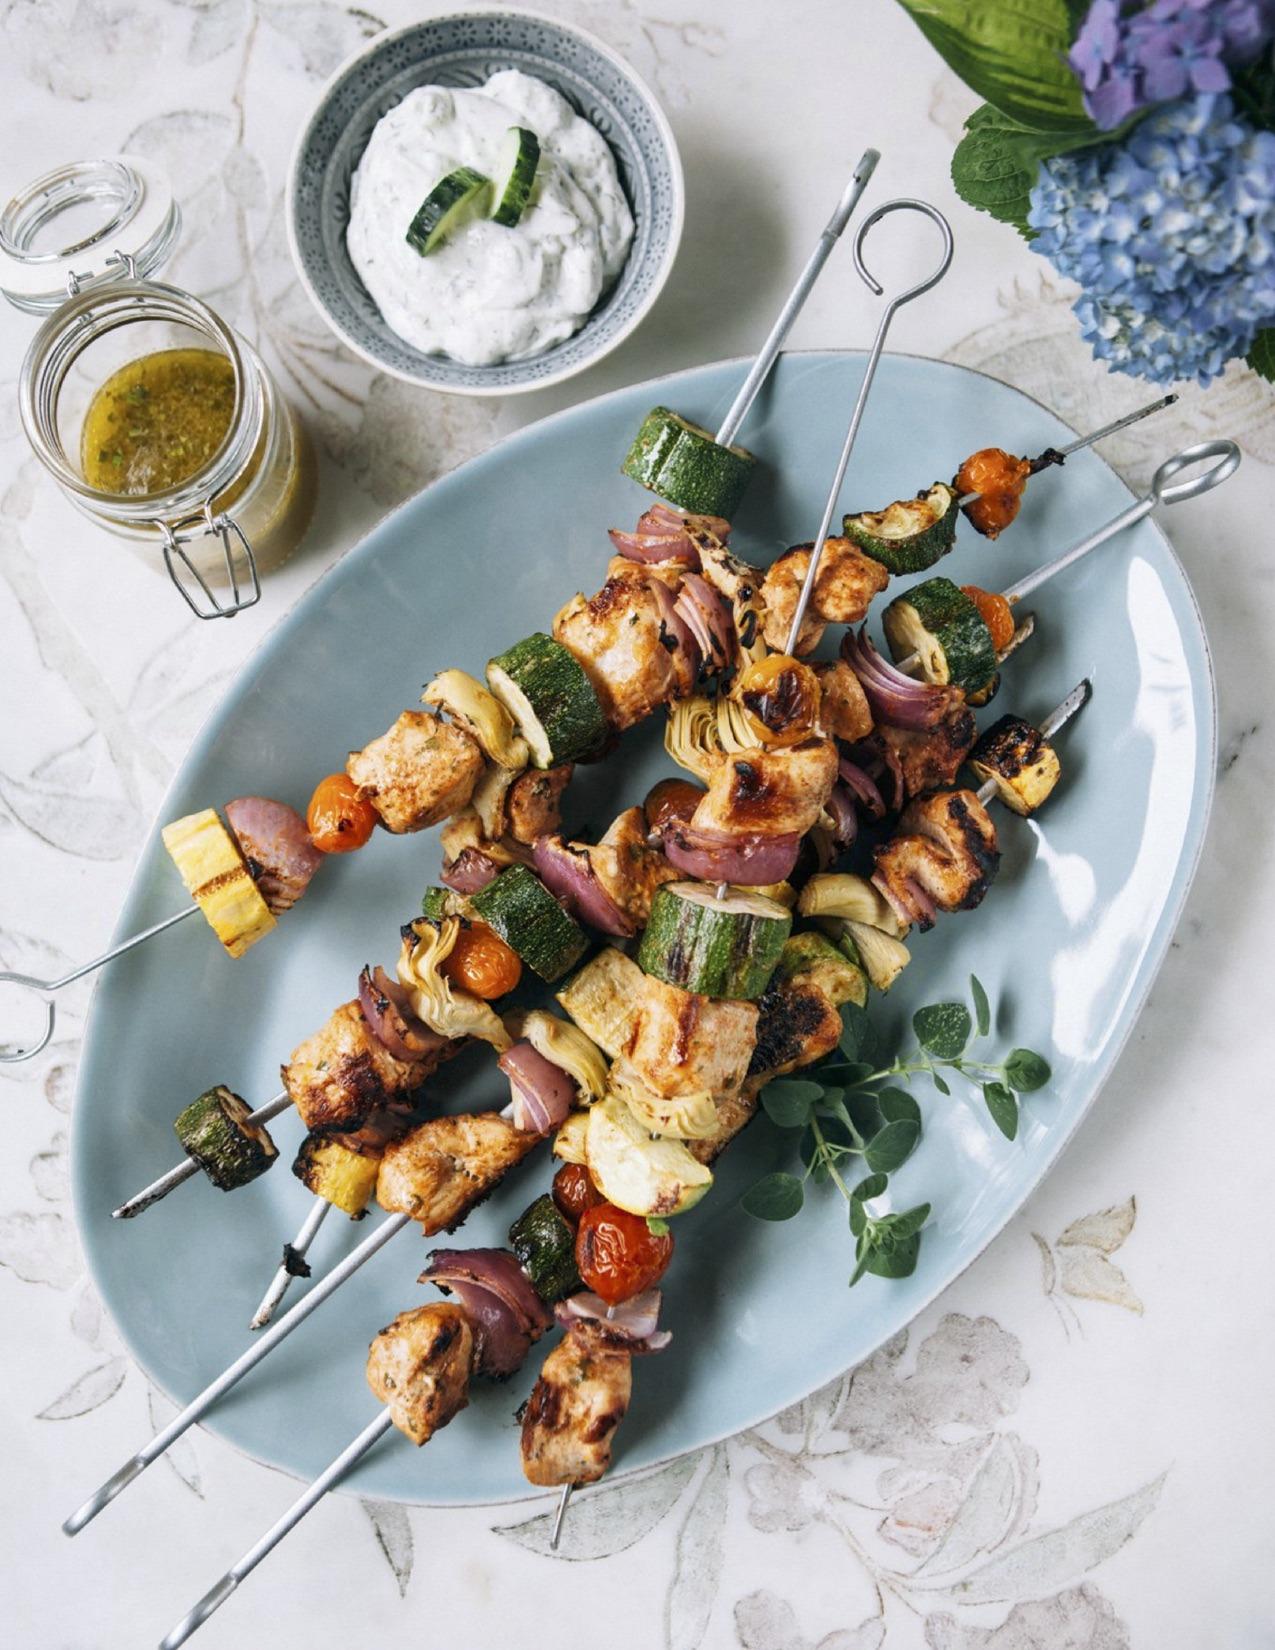 Yogurt-Marinated Chicken and Artichoke Skewers with Herbed Dressing